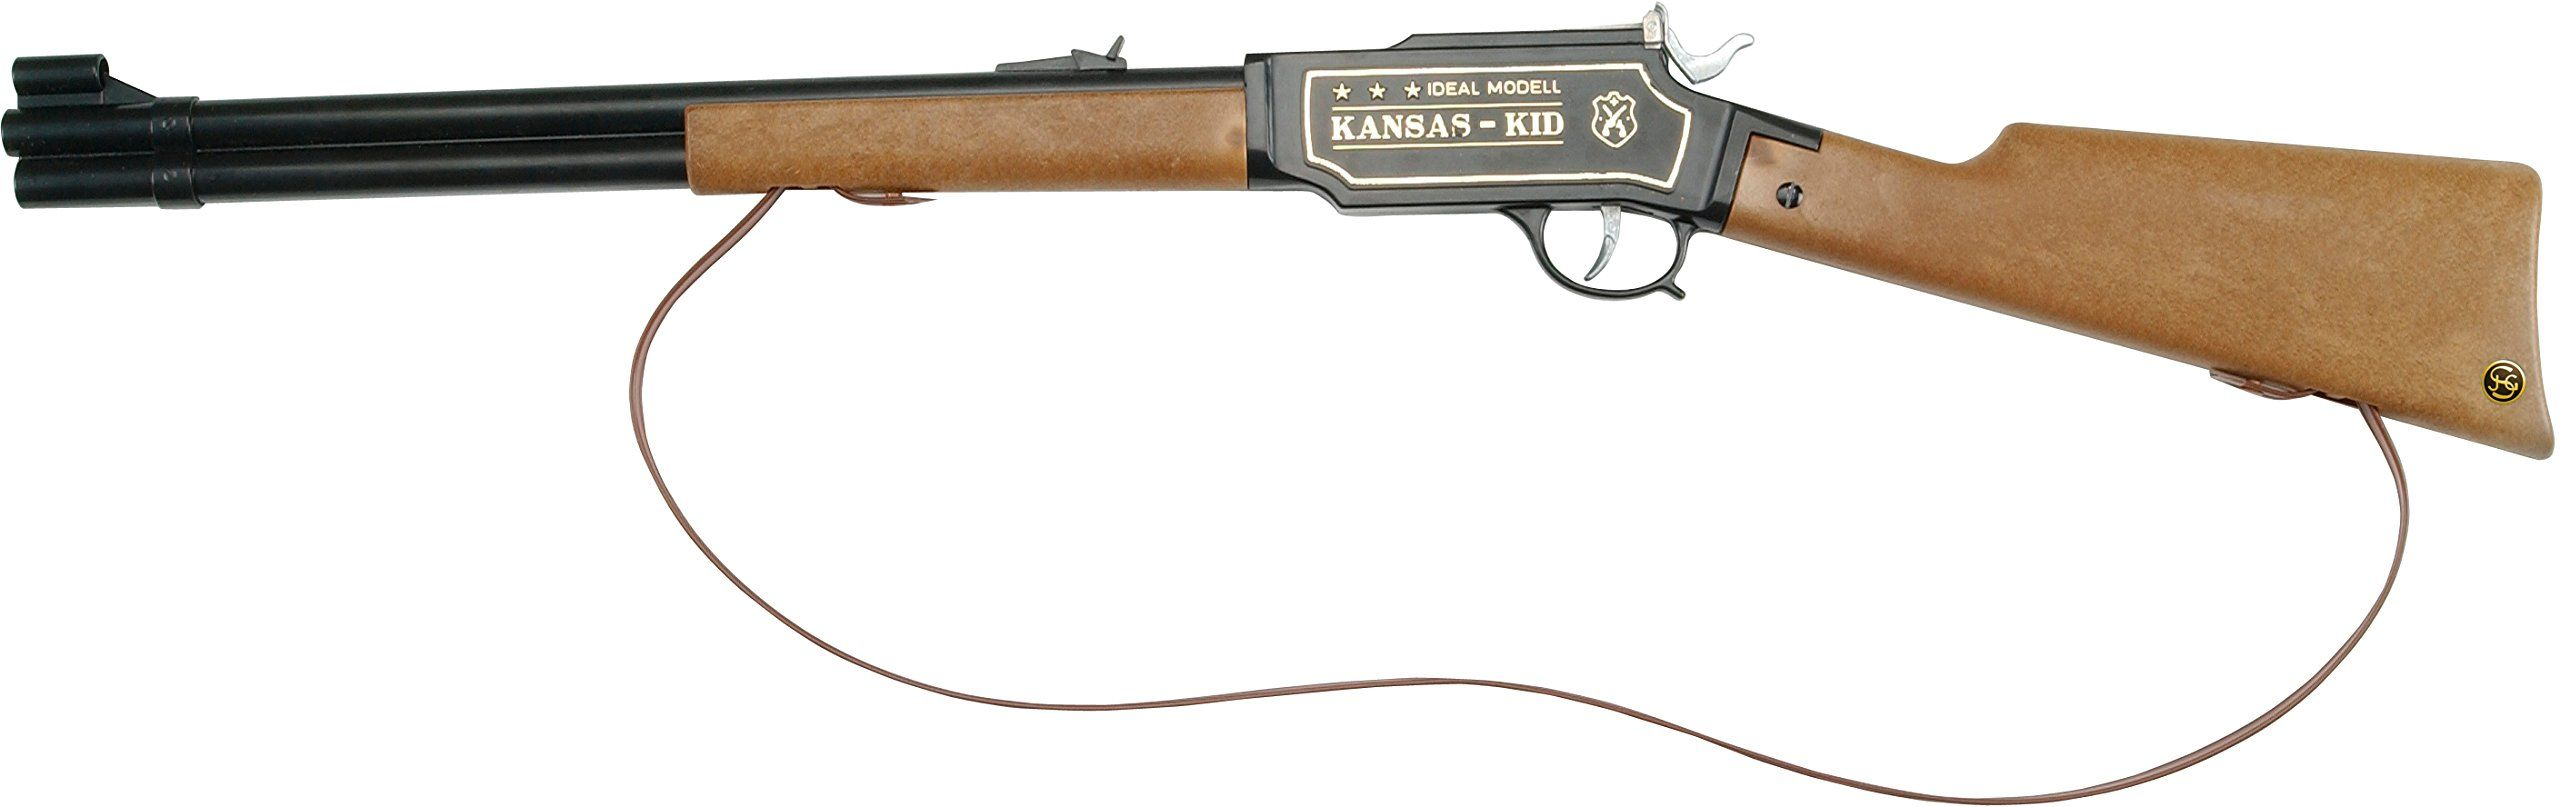 J.G. Schrödel 6119107 - Kansas Kid 100 strzałów na testerze karabin 73 cm